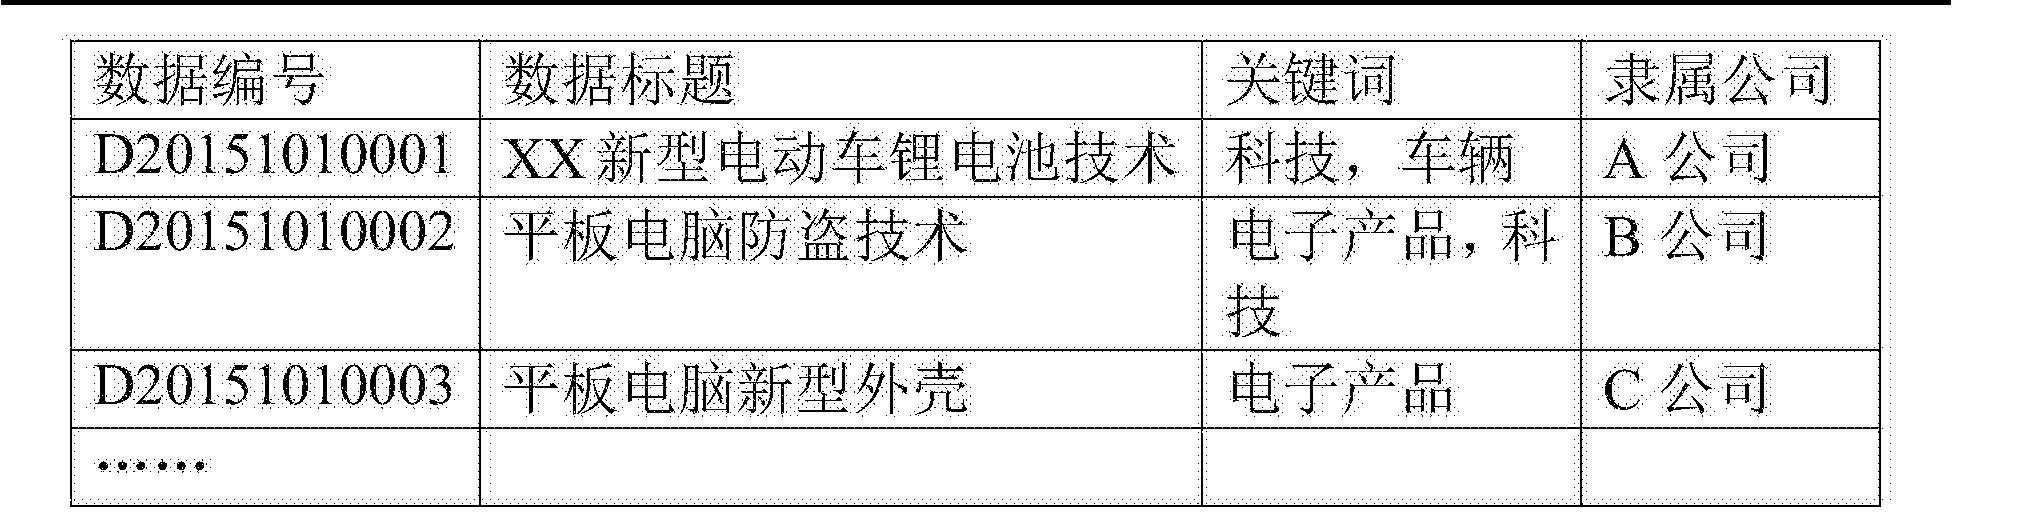 Figure CN105227681AD00061